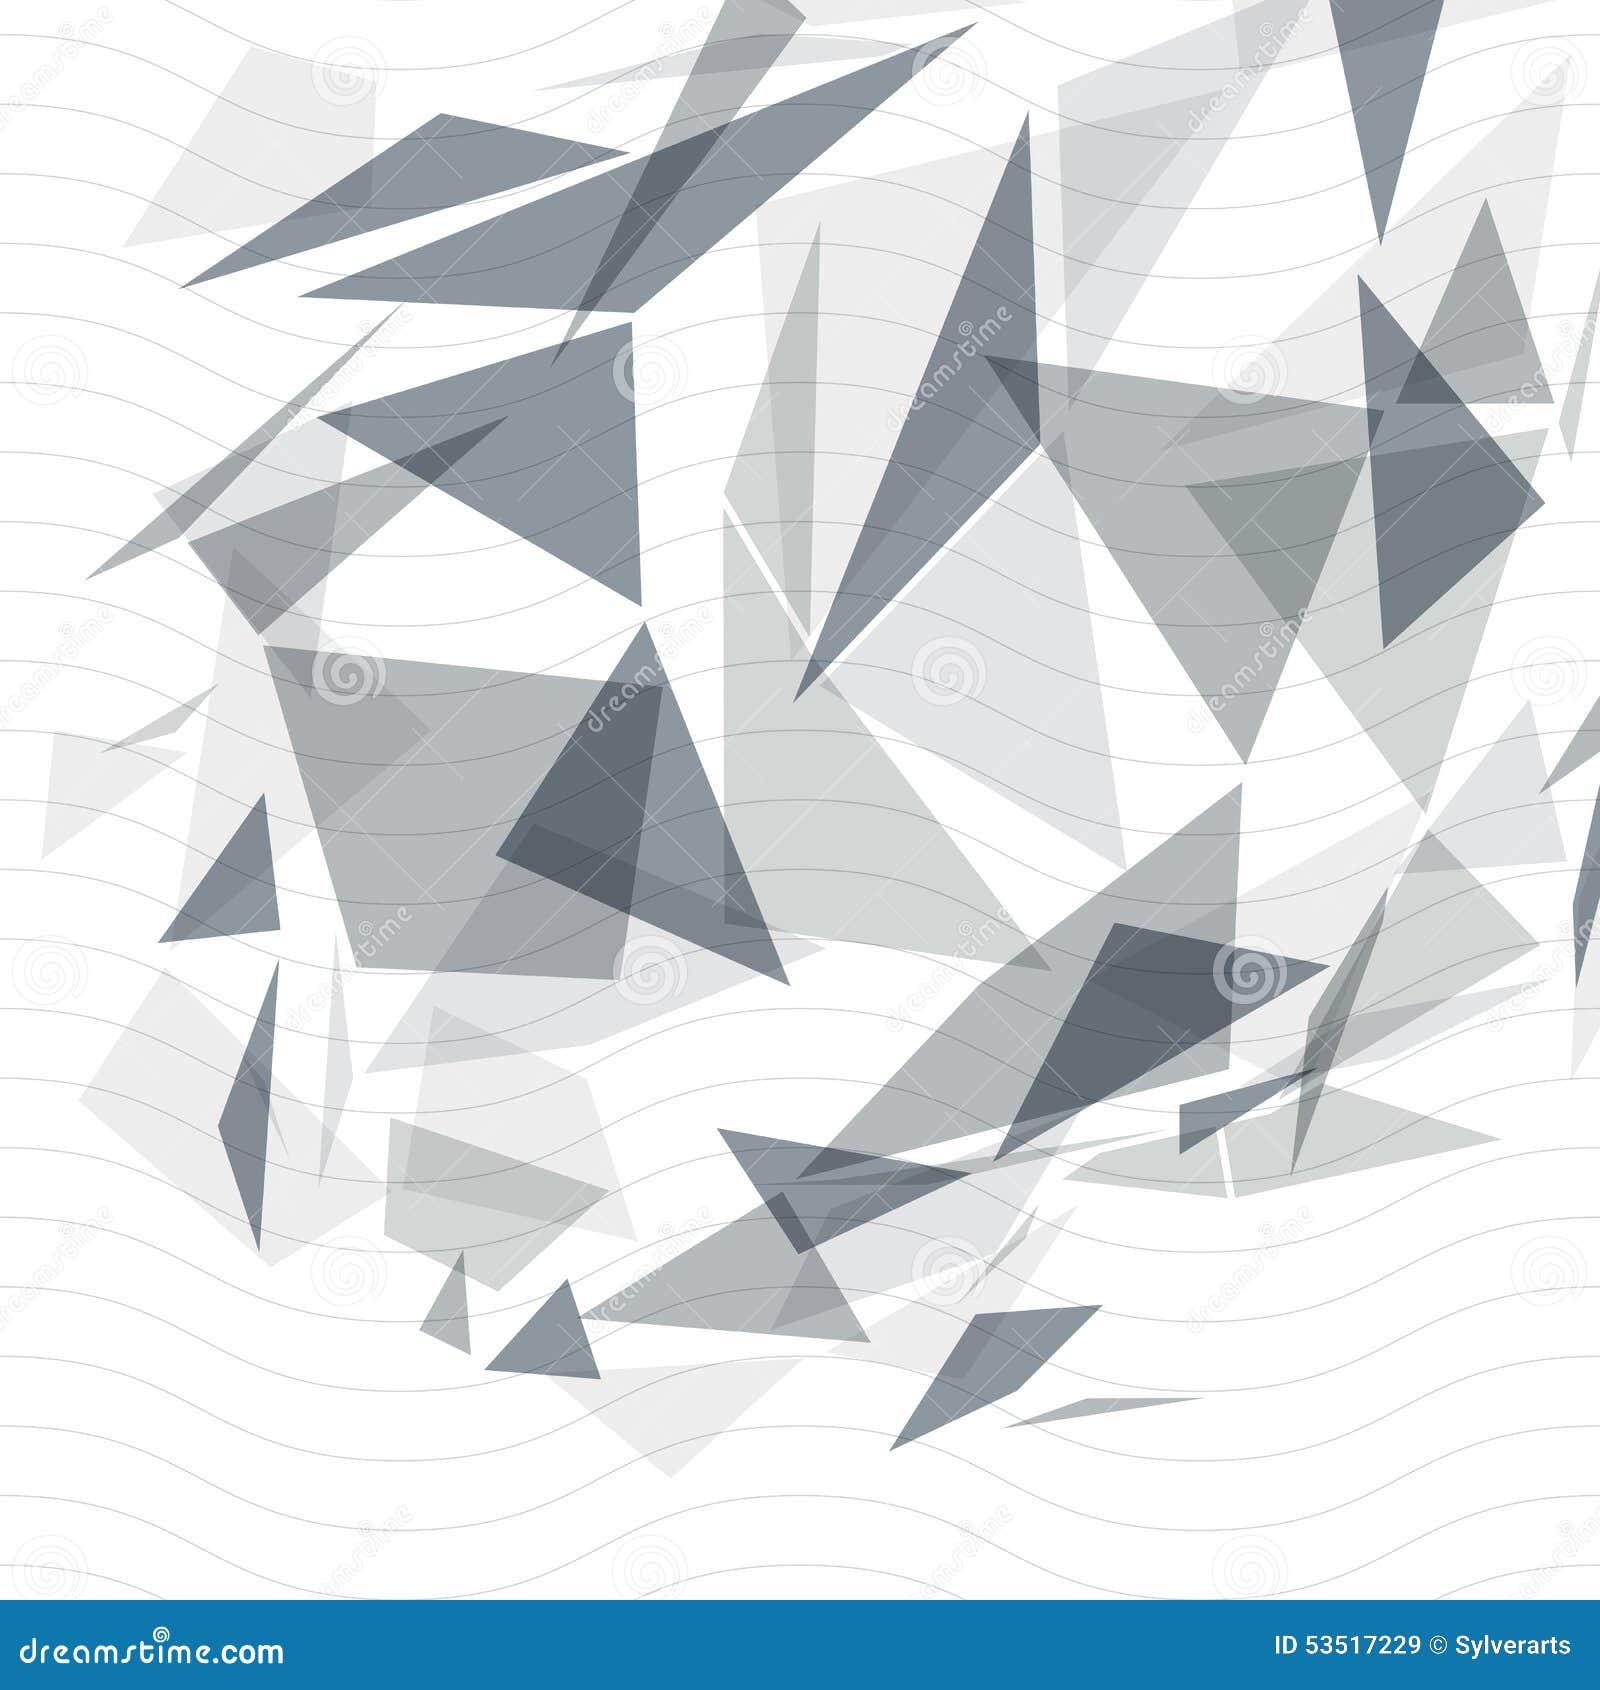 Contexto del dise o del arte de op sys del grayscale for Arte arquitectura y diseno definicion